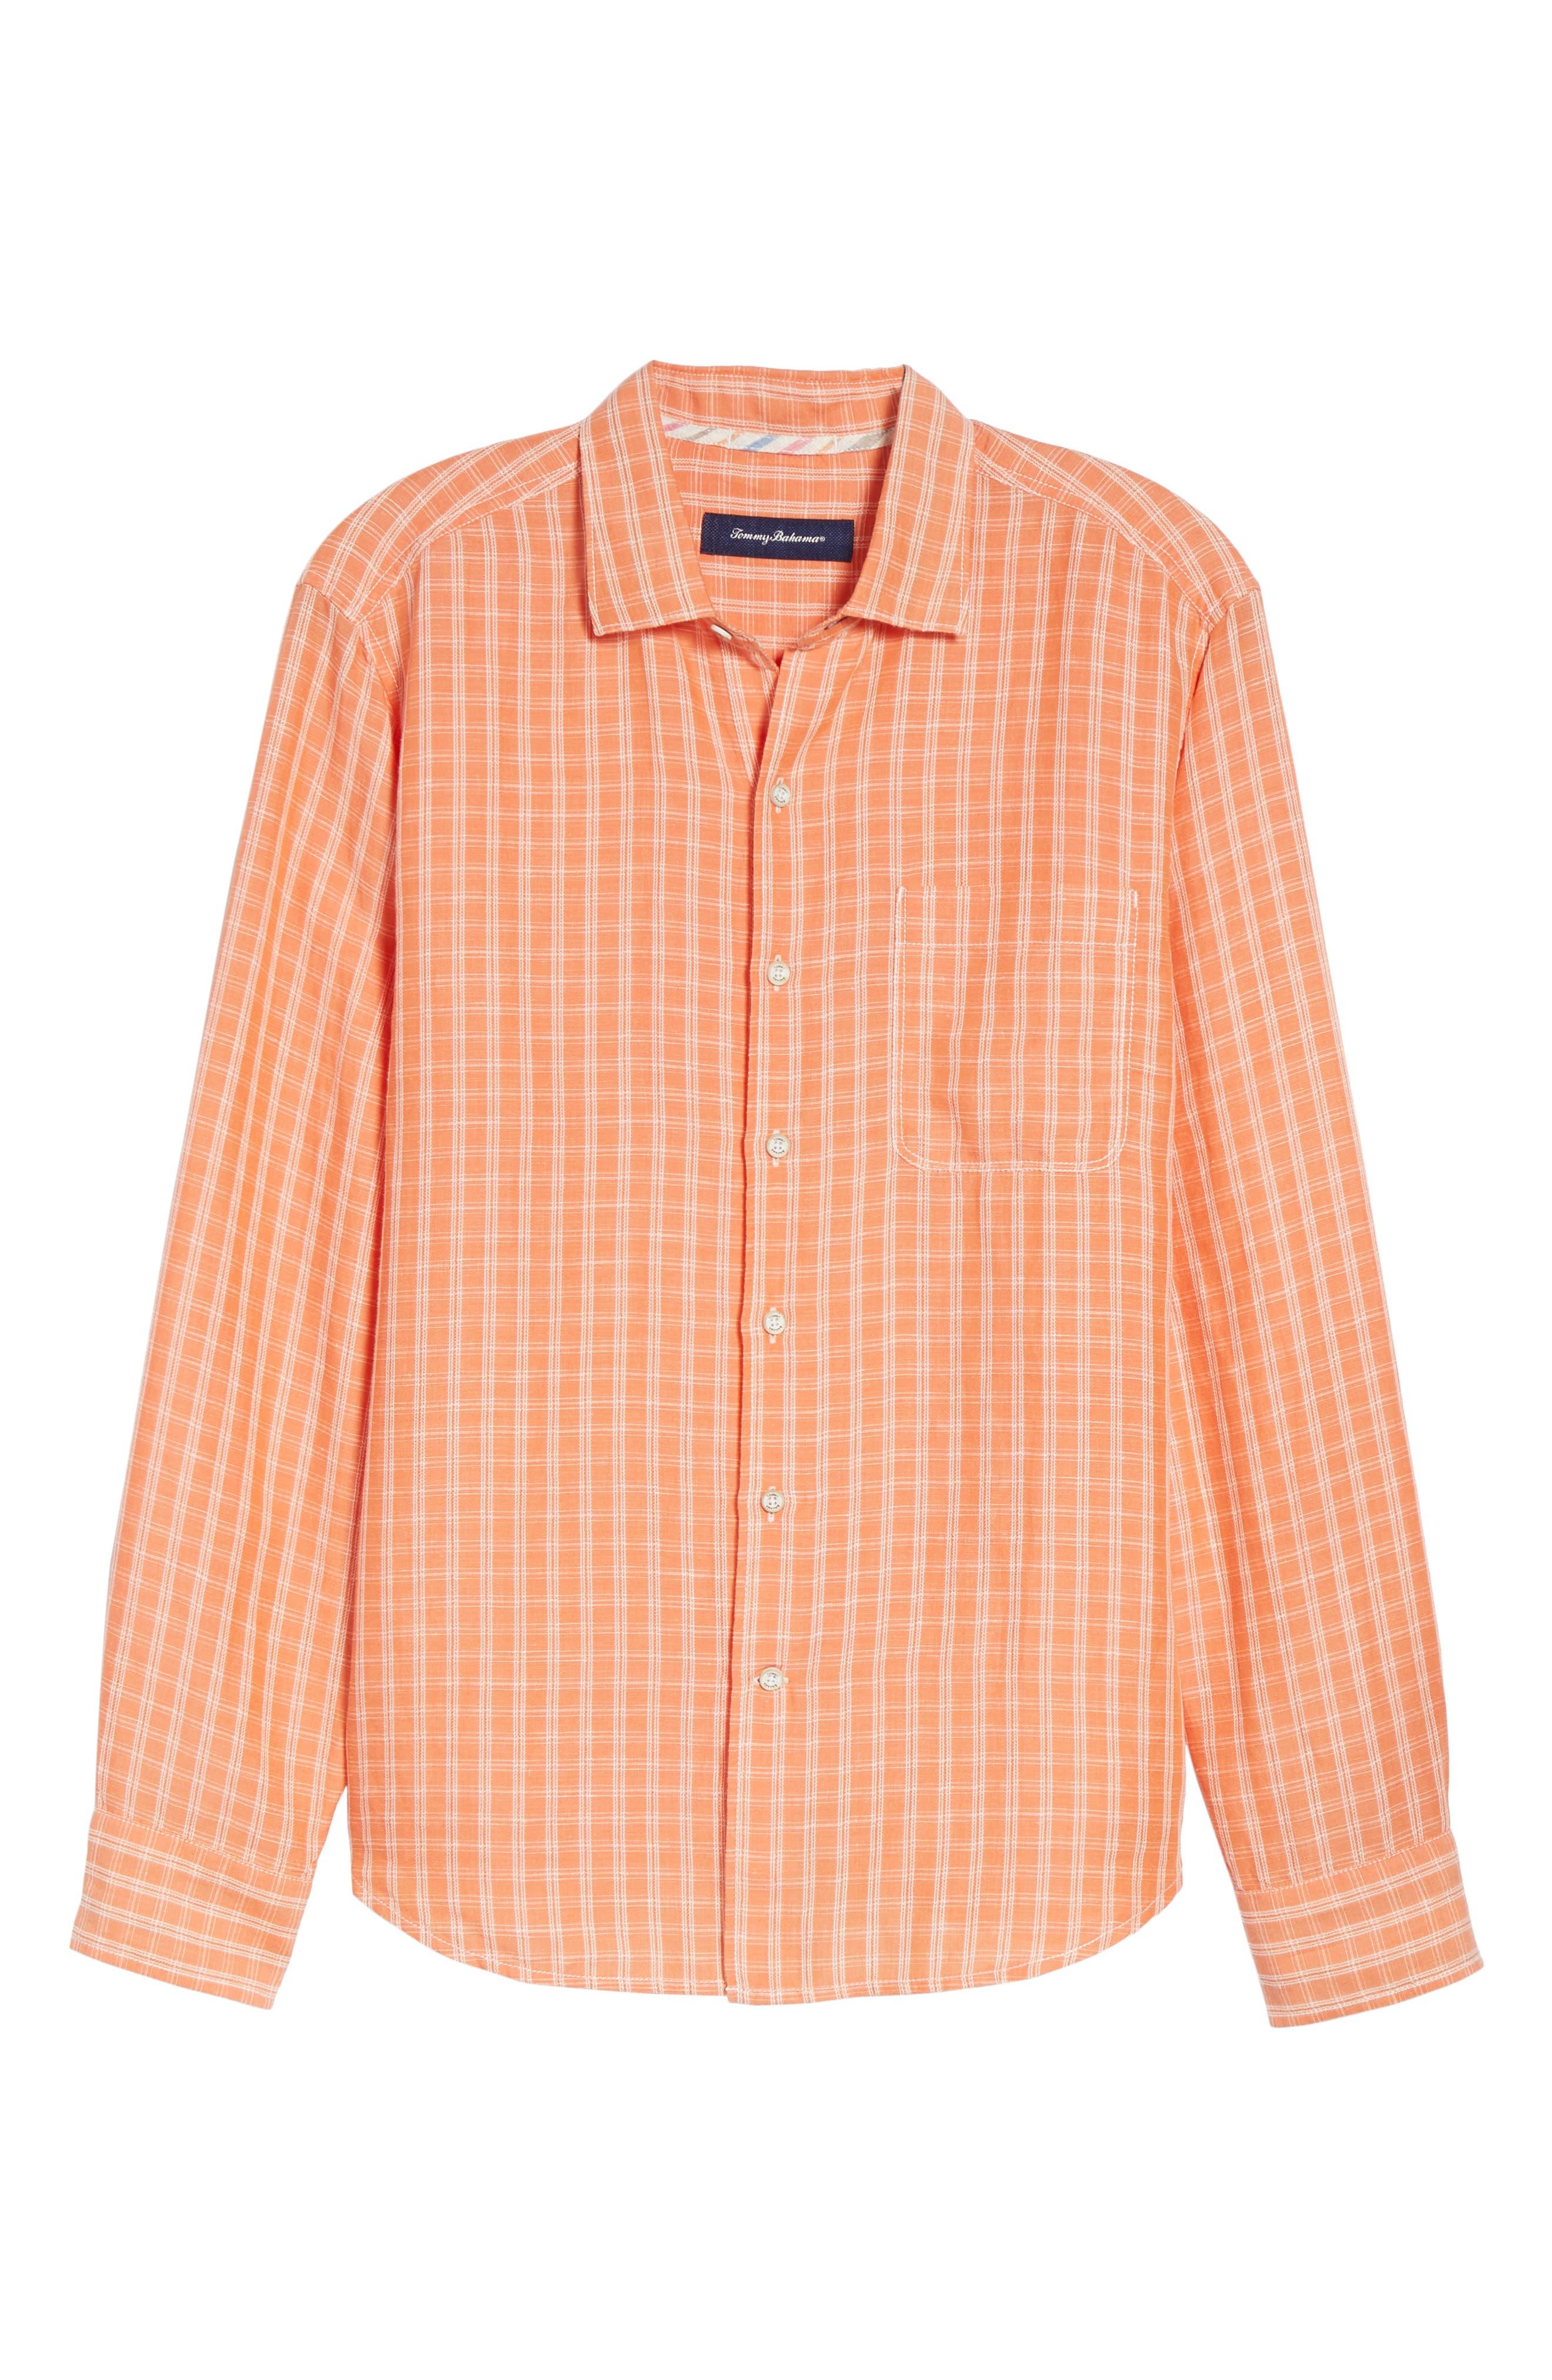 Plaid Sand Linen Blend Sport Shirt,                             Alternate thumbnail 6, color,                             Curuba